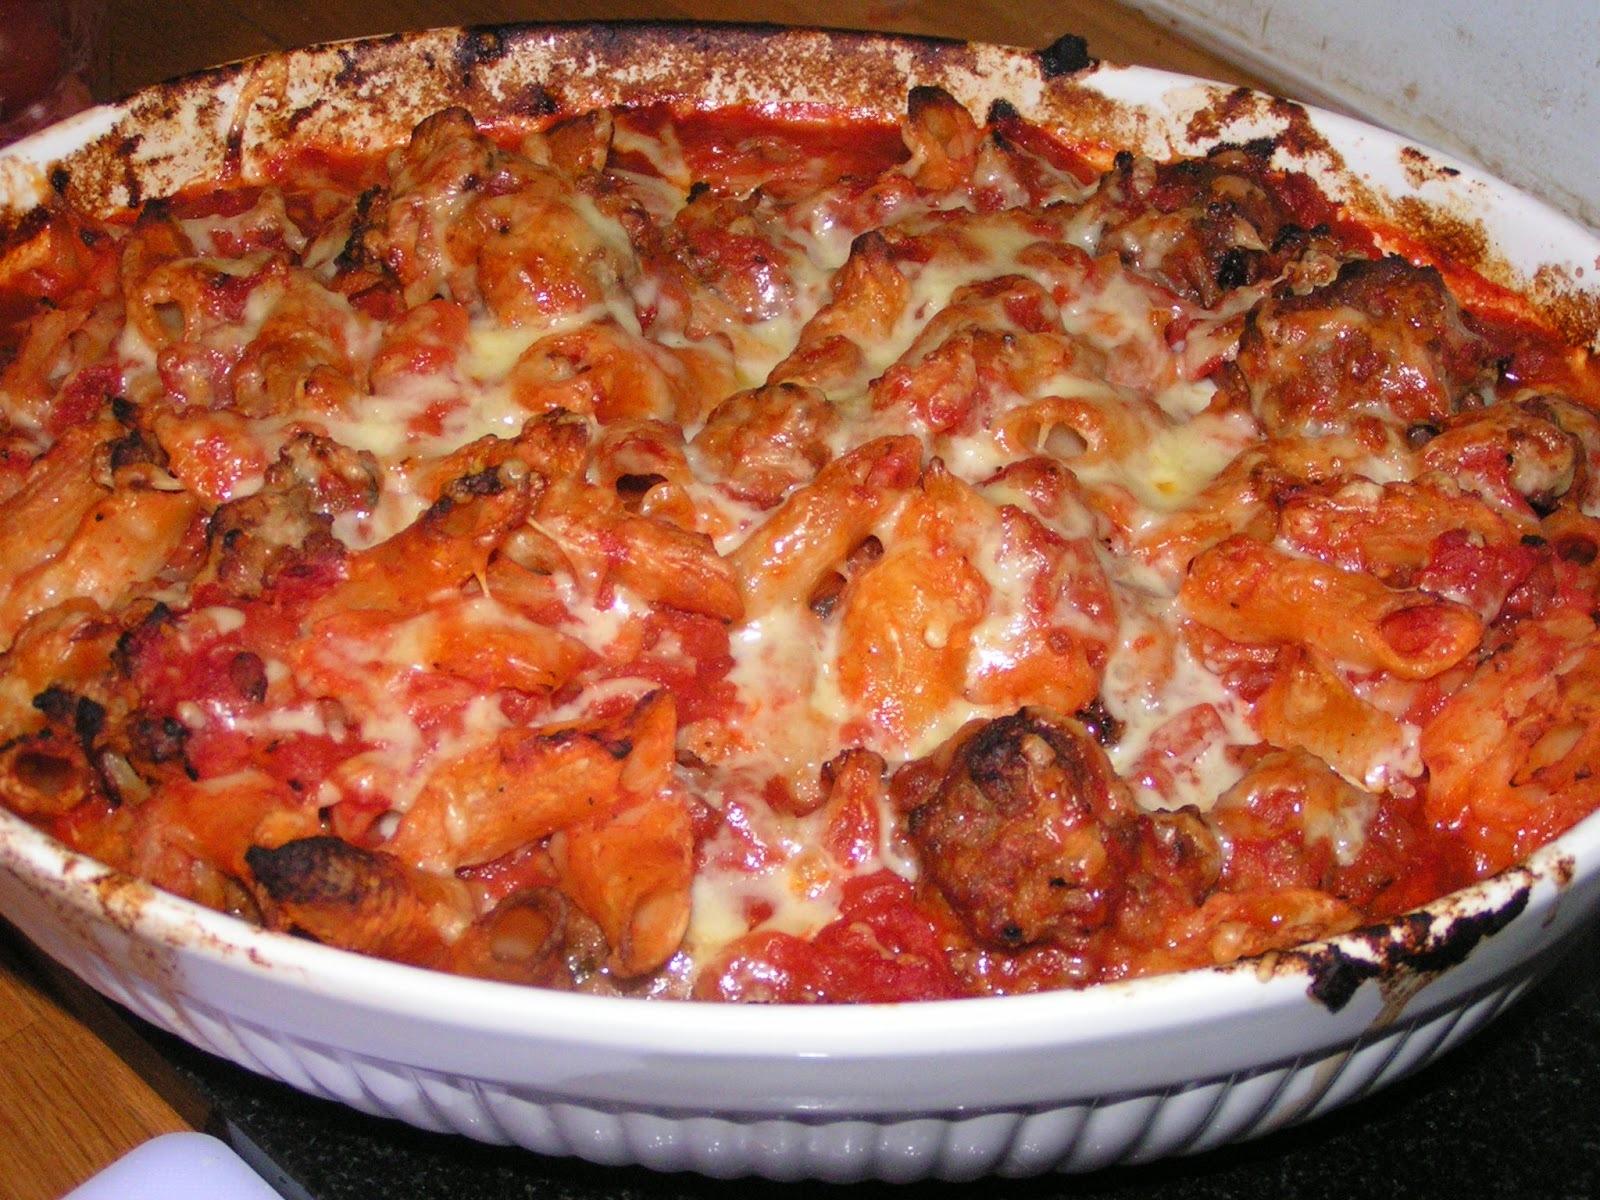 Sausage meatball pasta bake - the answer to bulk child feeding